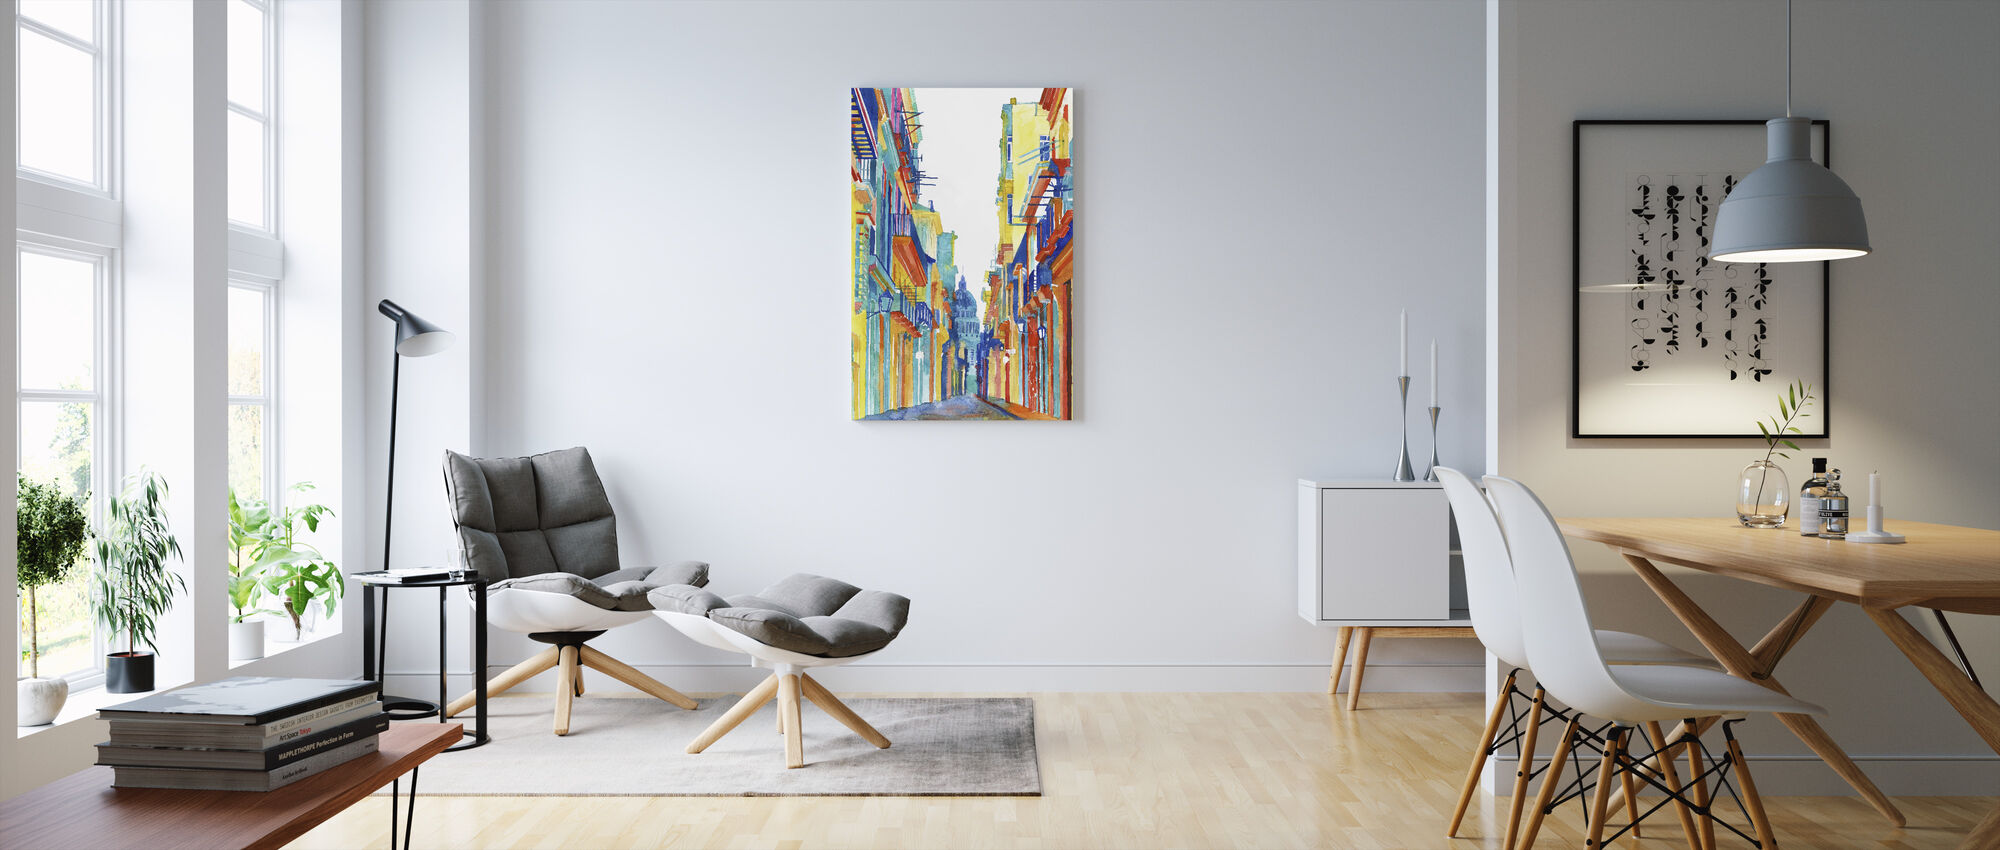 Havanna Gatan - Canvastavla - Vardagsrum